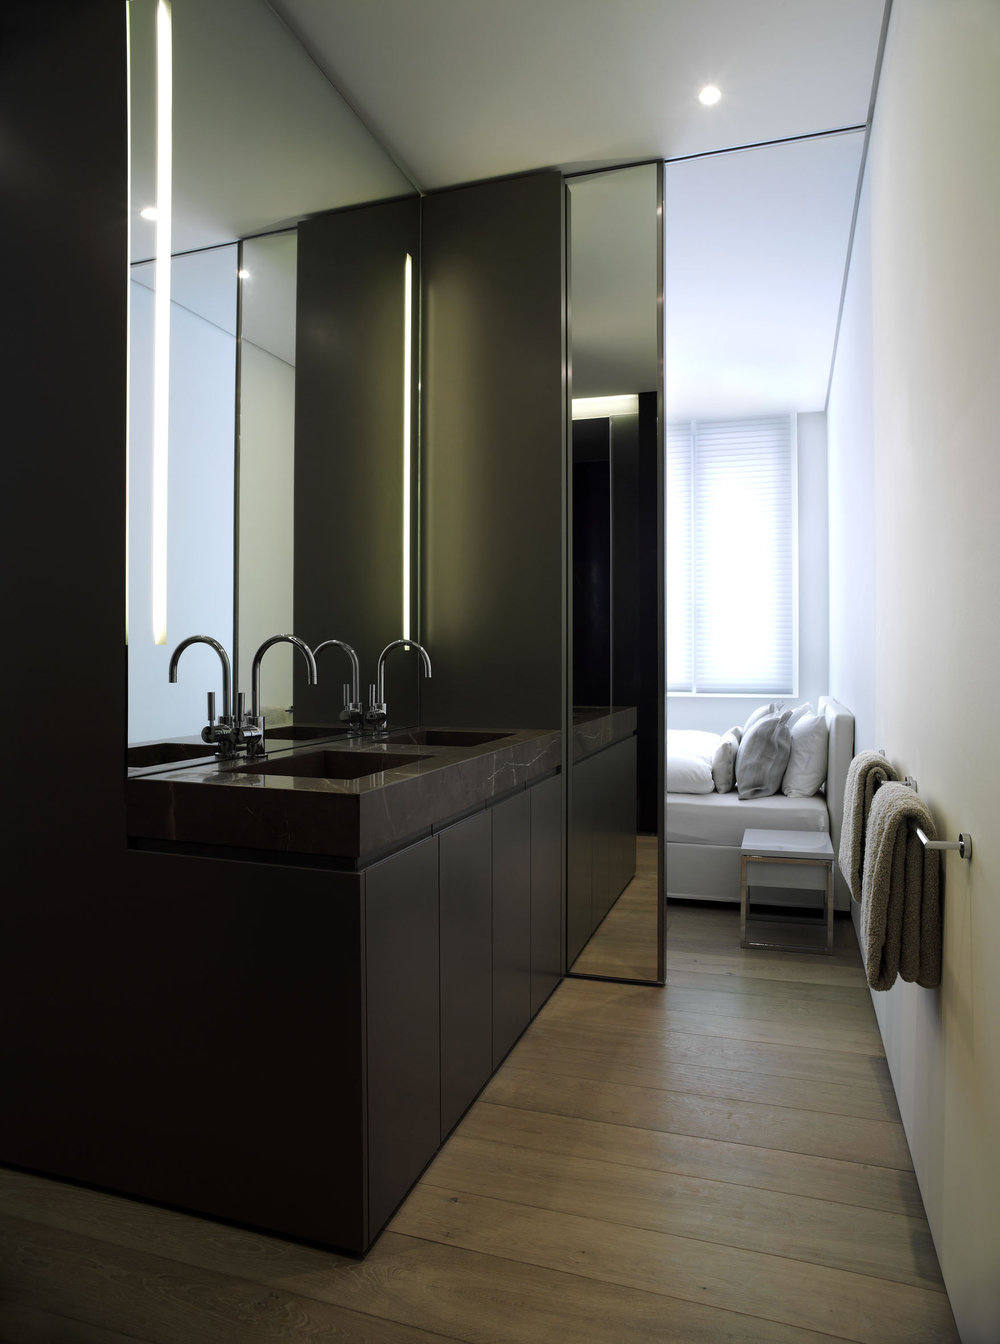 048_iria_degen_interiors_house_evilard4.jpg